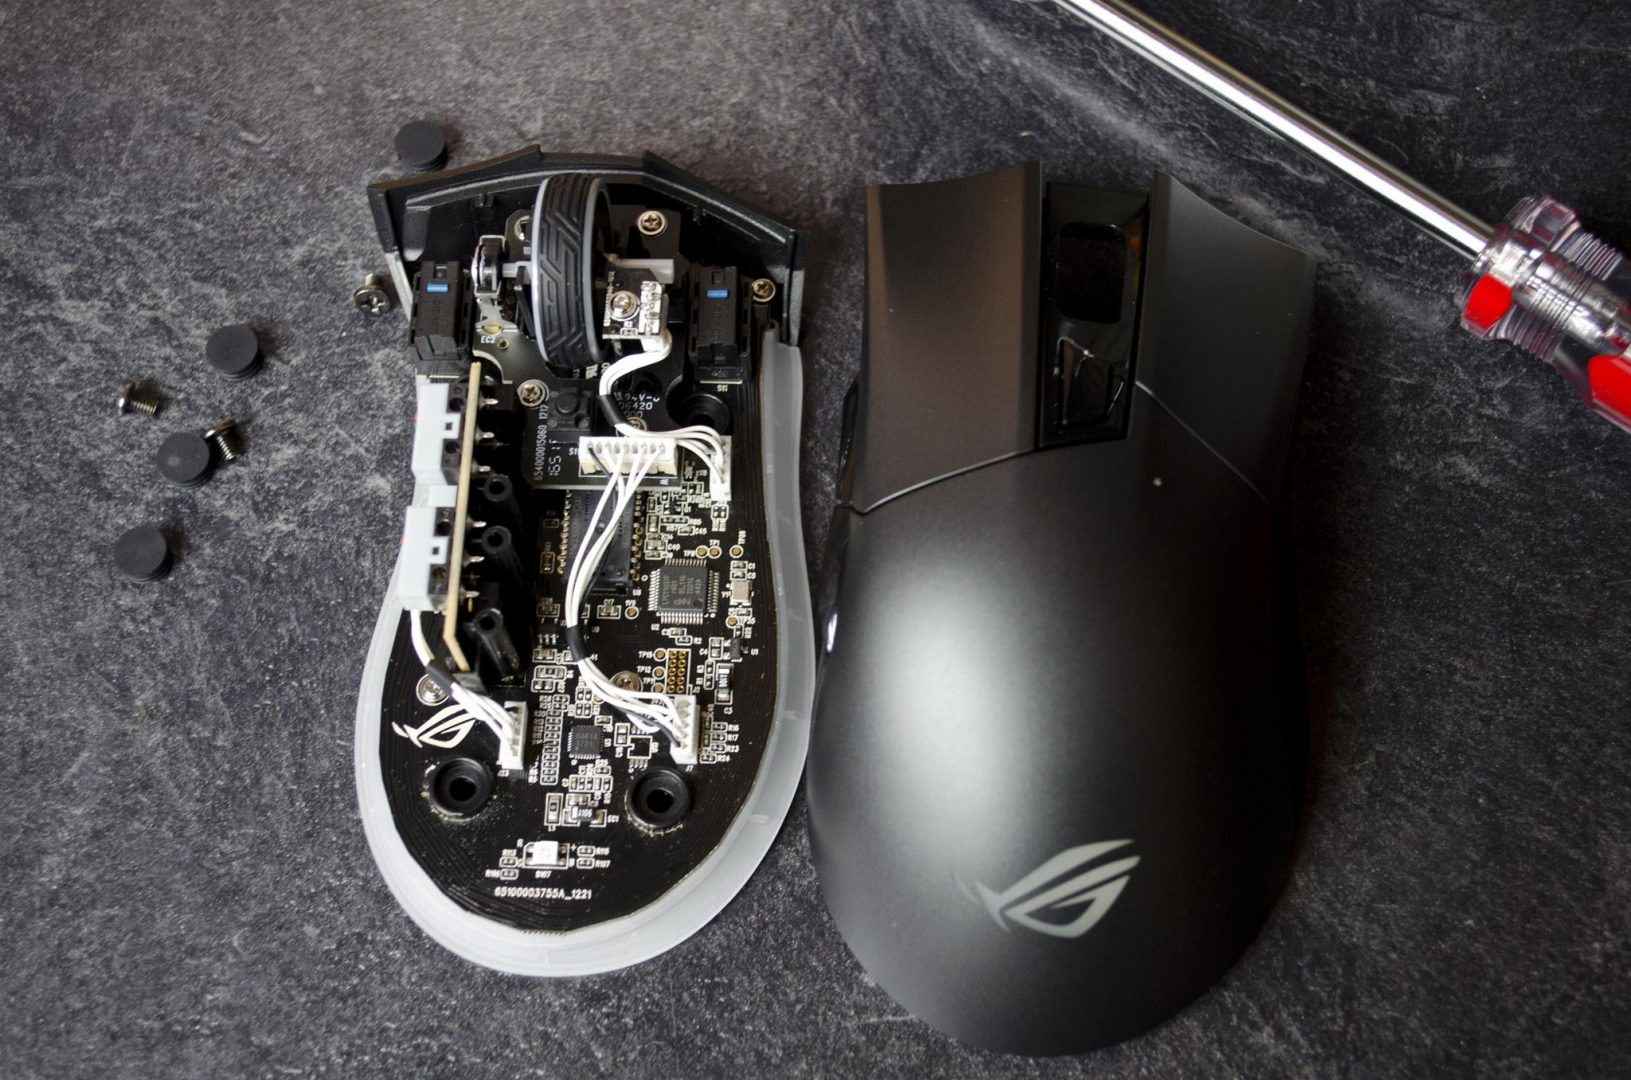 asus rog gladius ii gaming mouse review_10